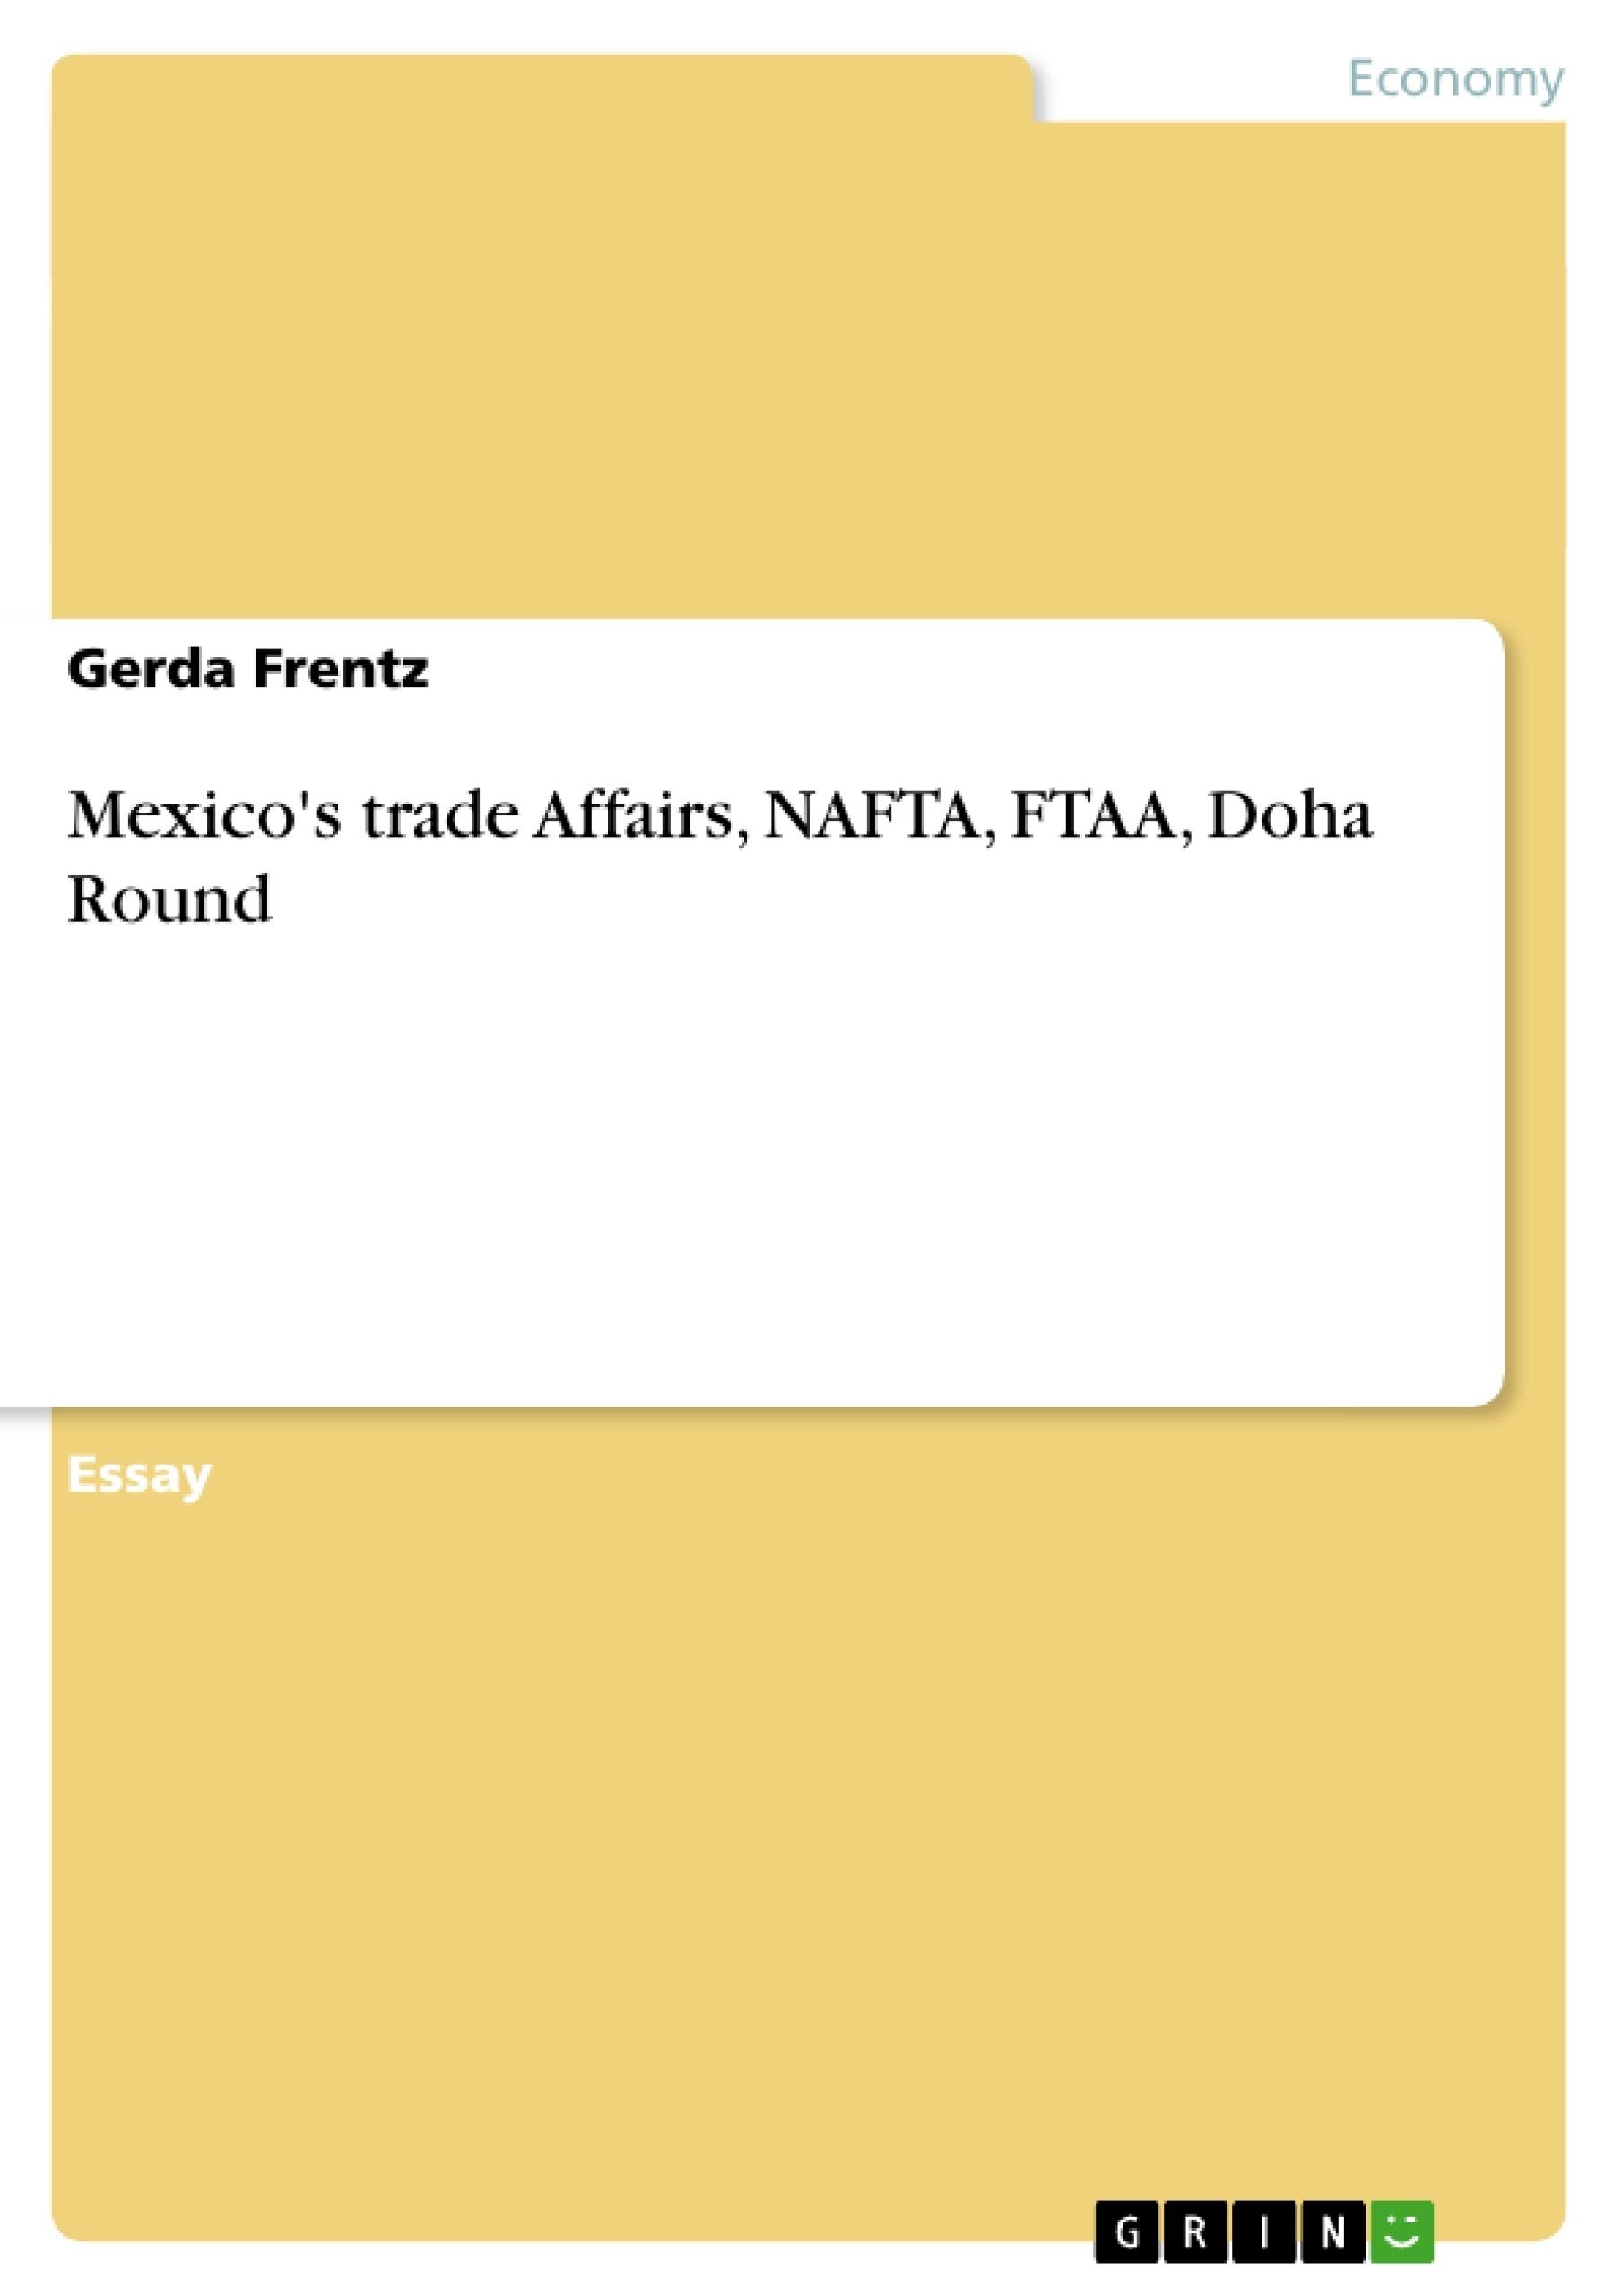 Title: Mexico's trade Affairs, NAFTA, FTAA, Doha Round